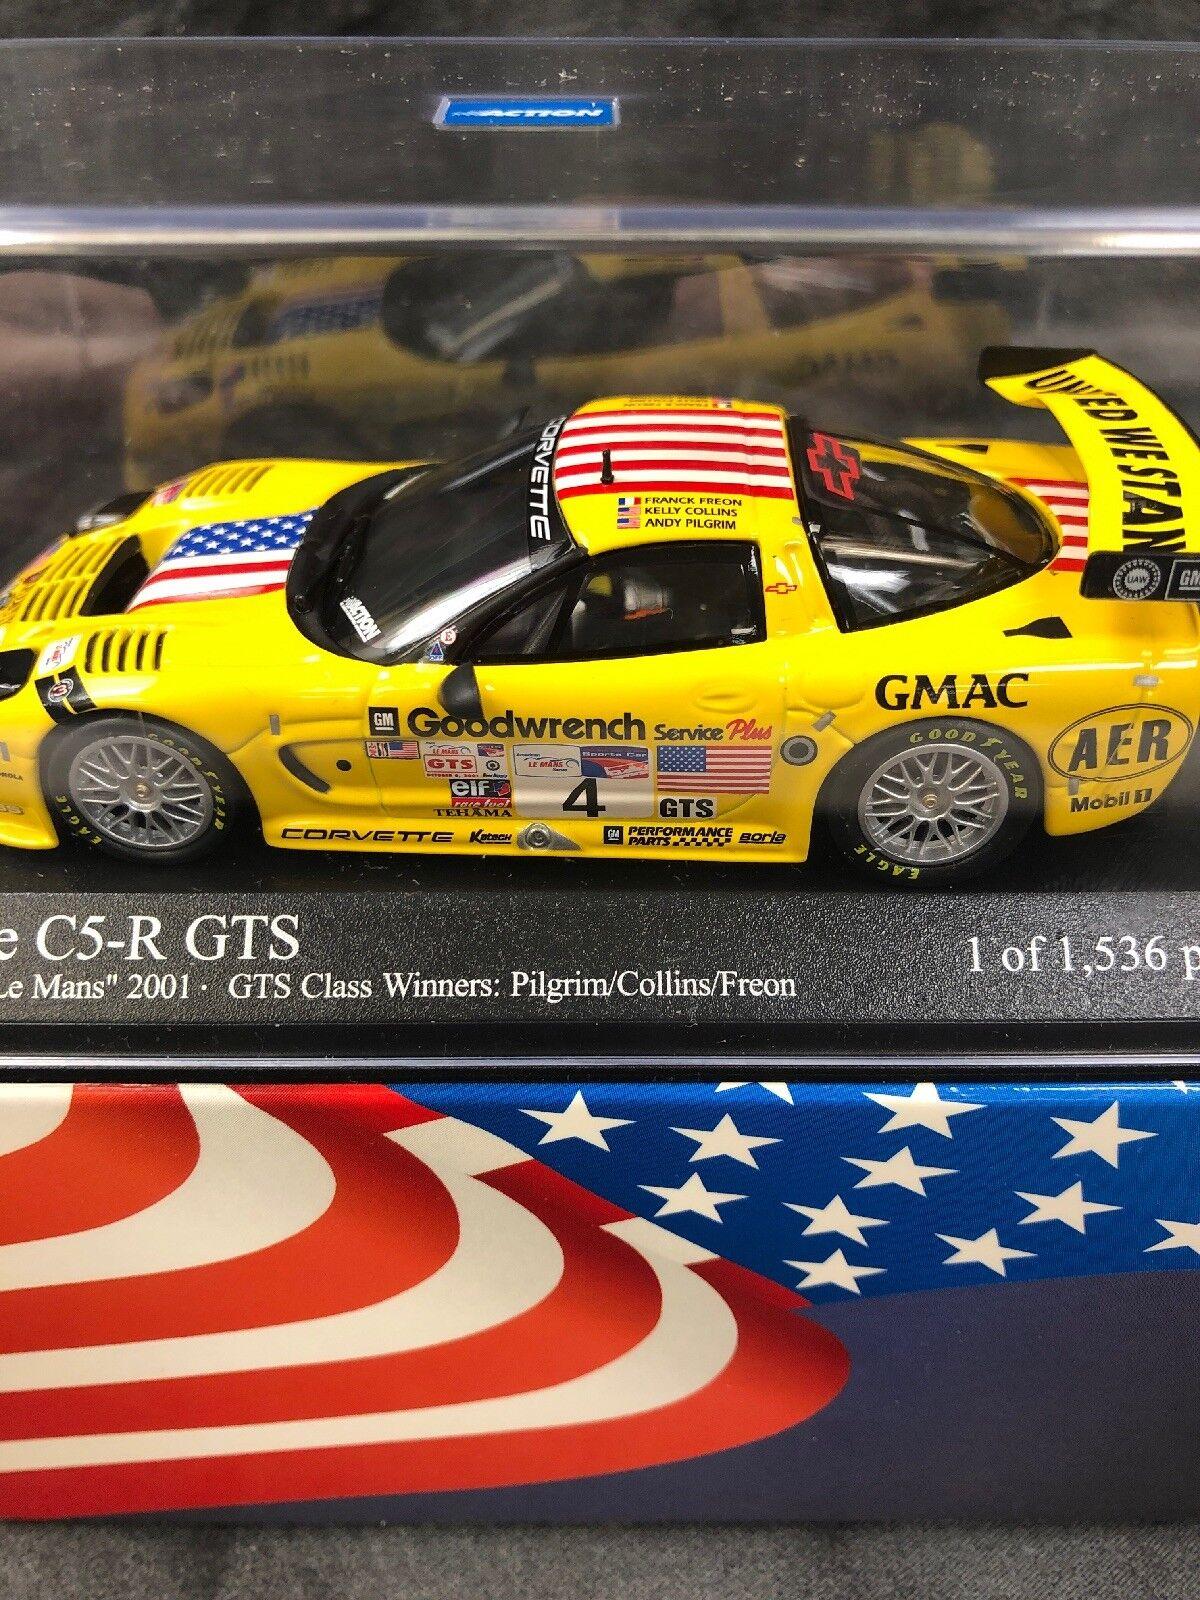 9 11 TRIBUTE ACTION CORVETTE C5-R GTS ALMS  2001 GTS CLASS WINNERS OF 1,536